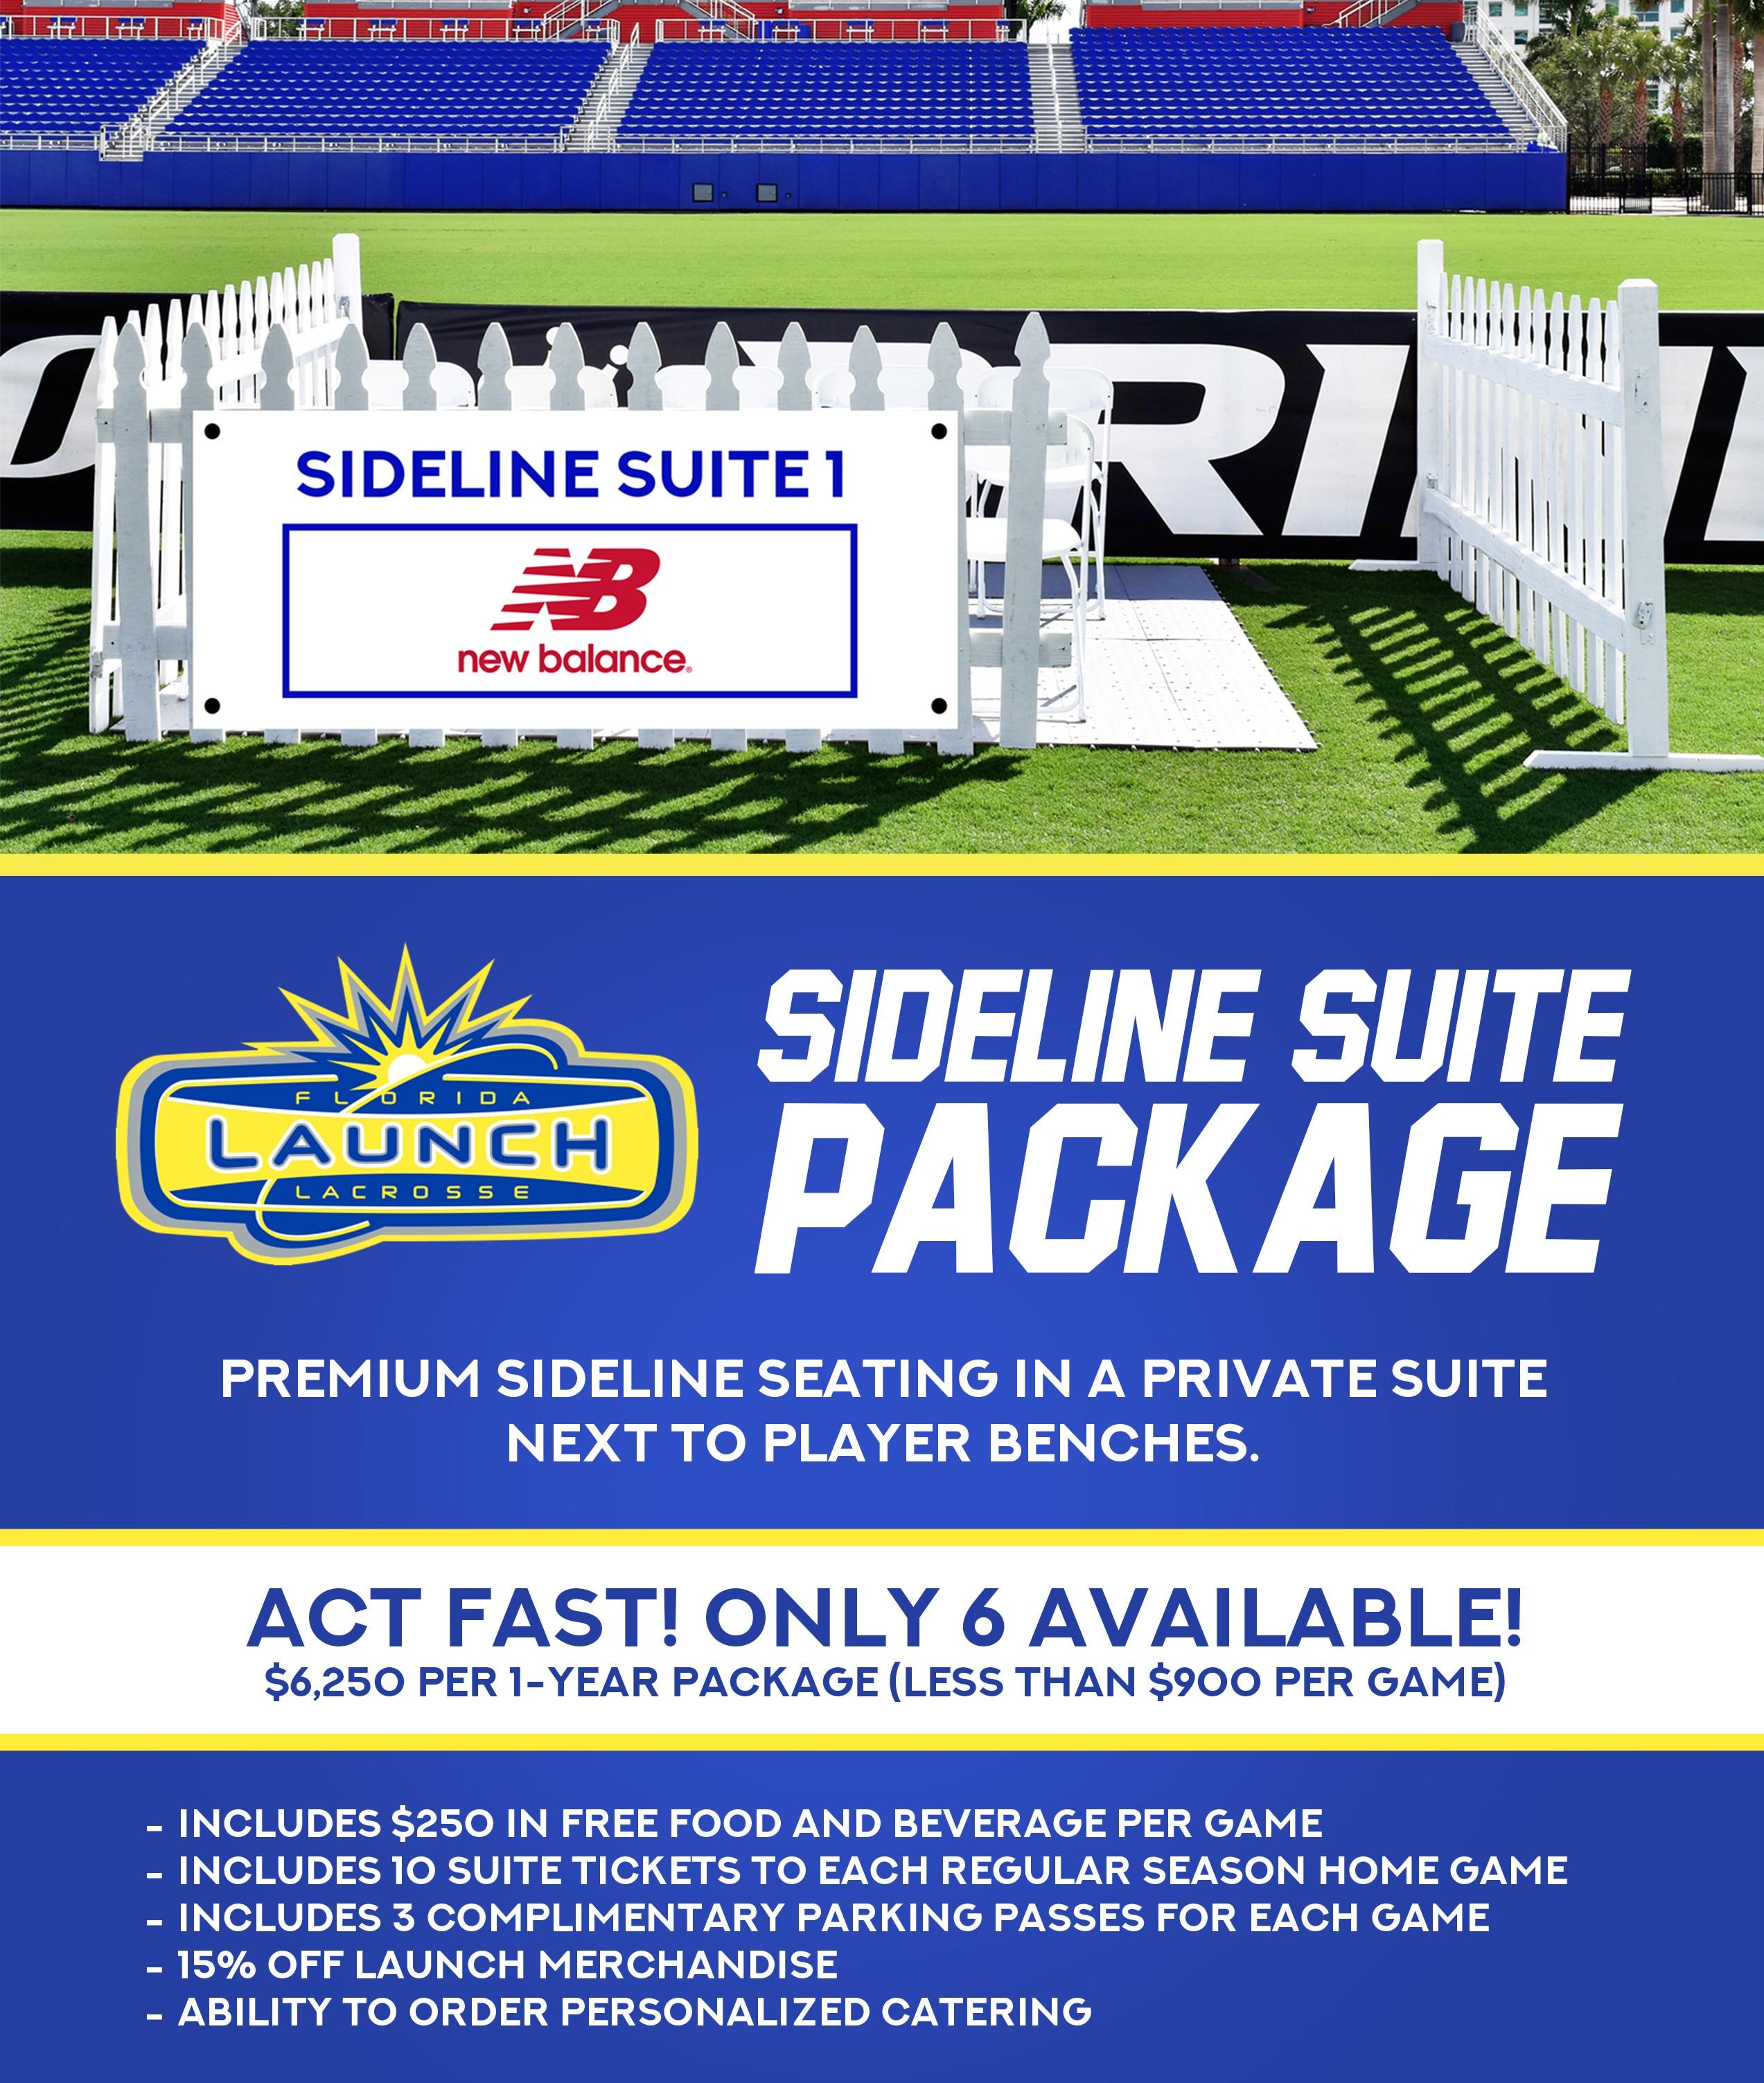 Sideline Suites